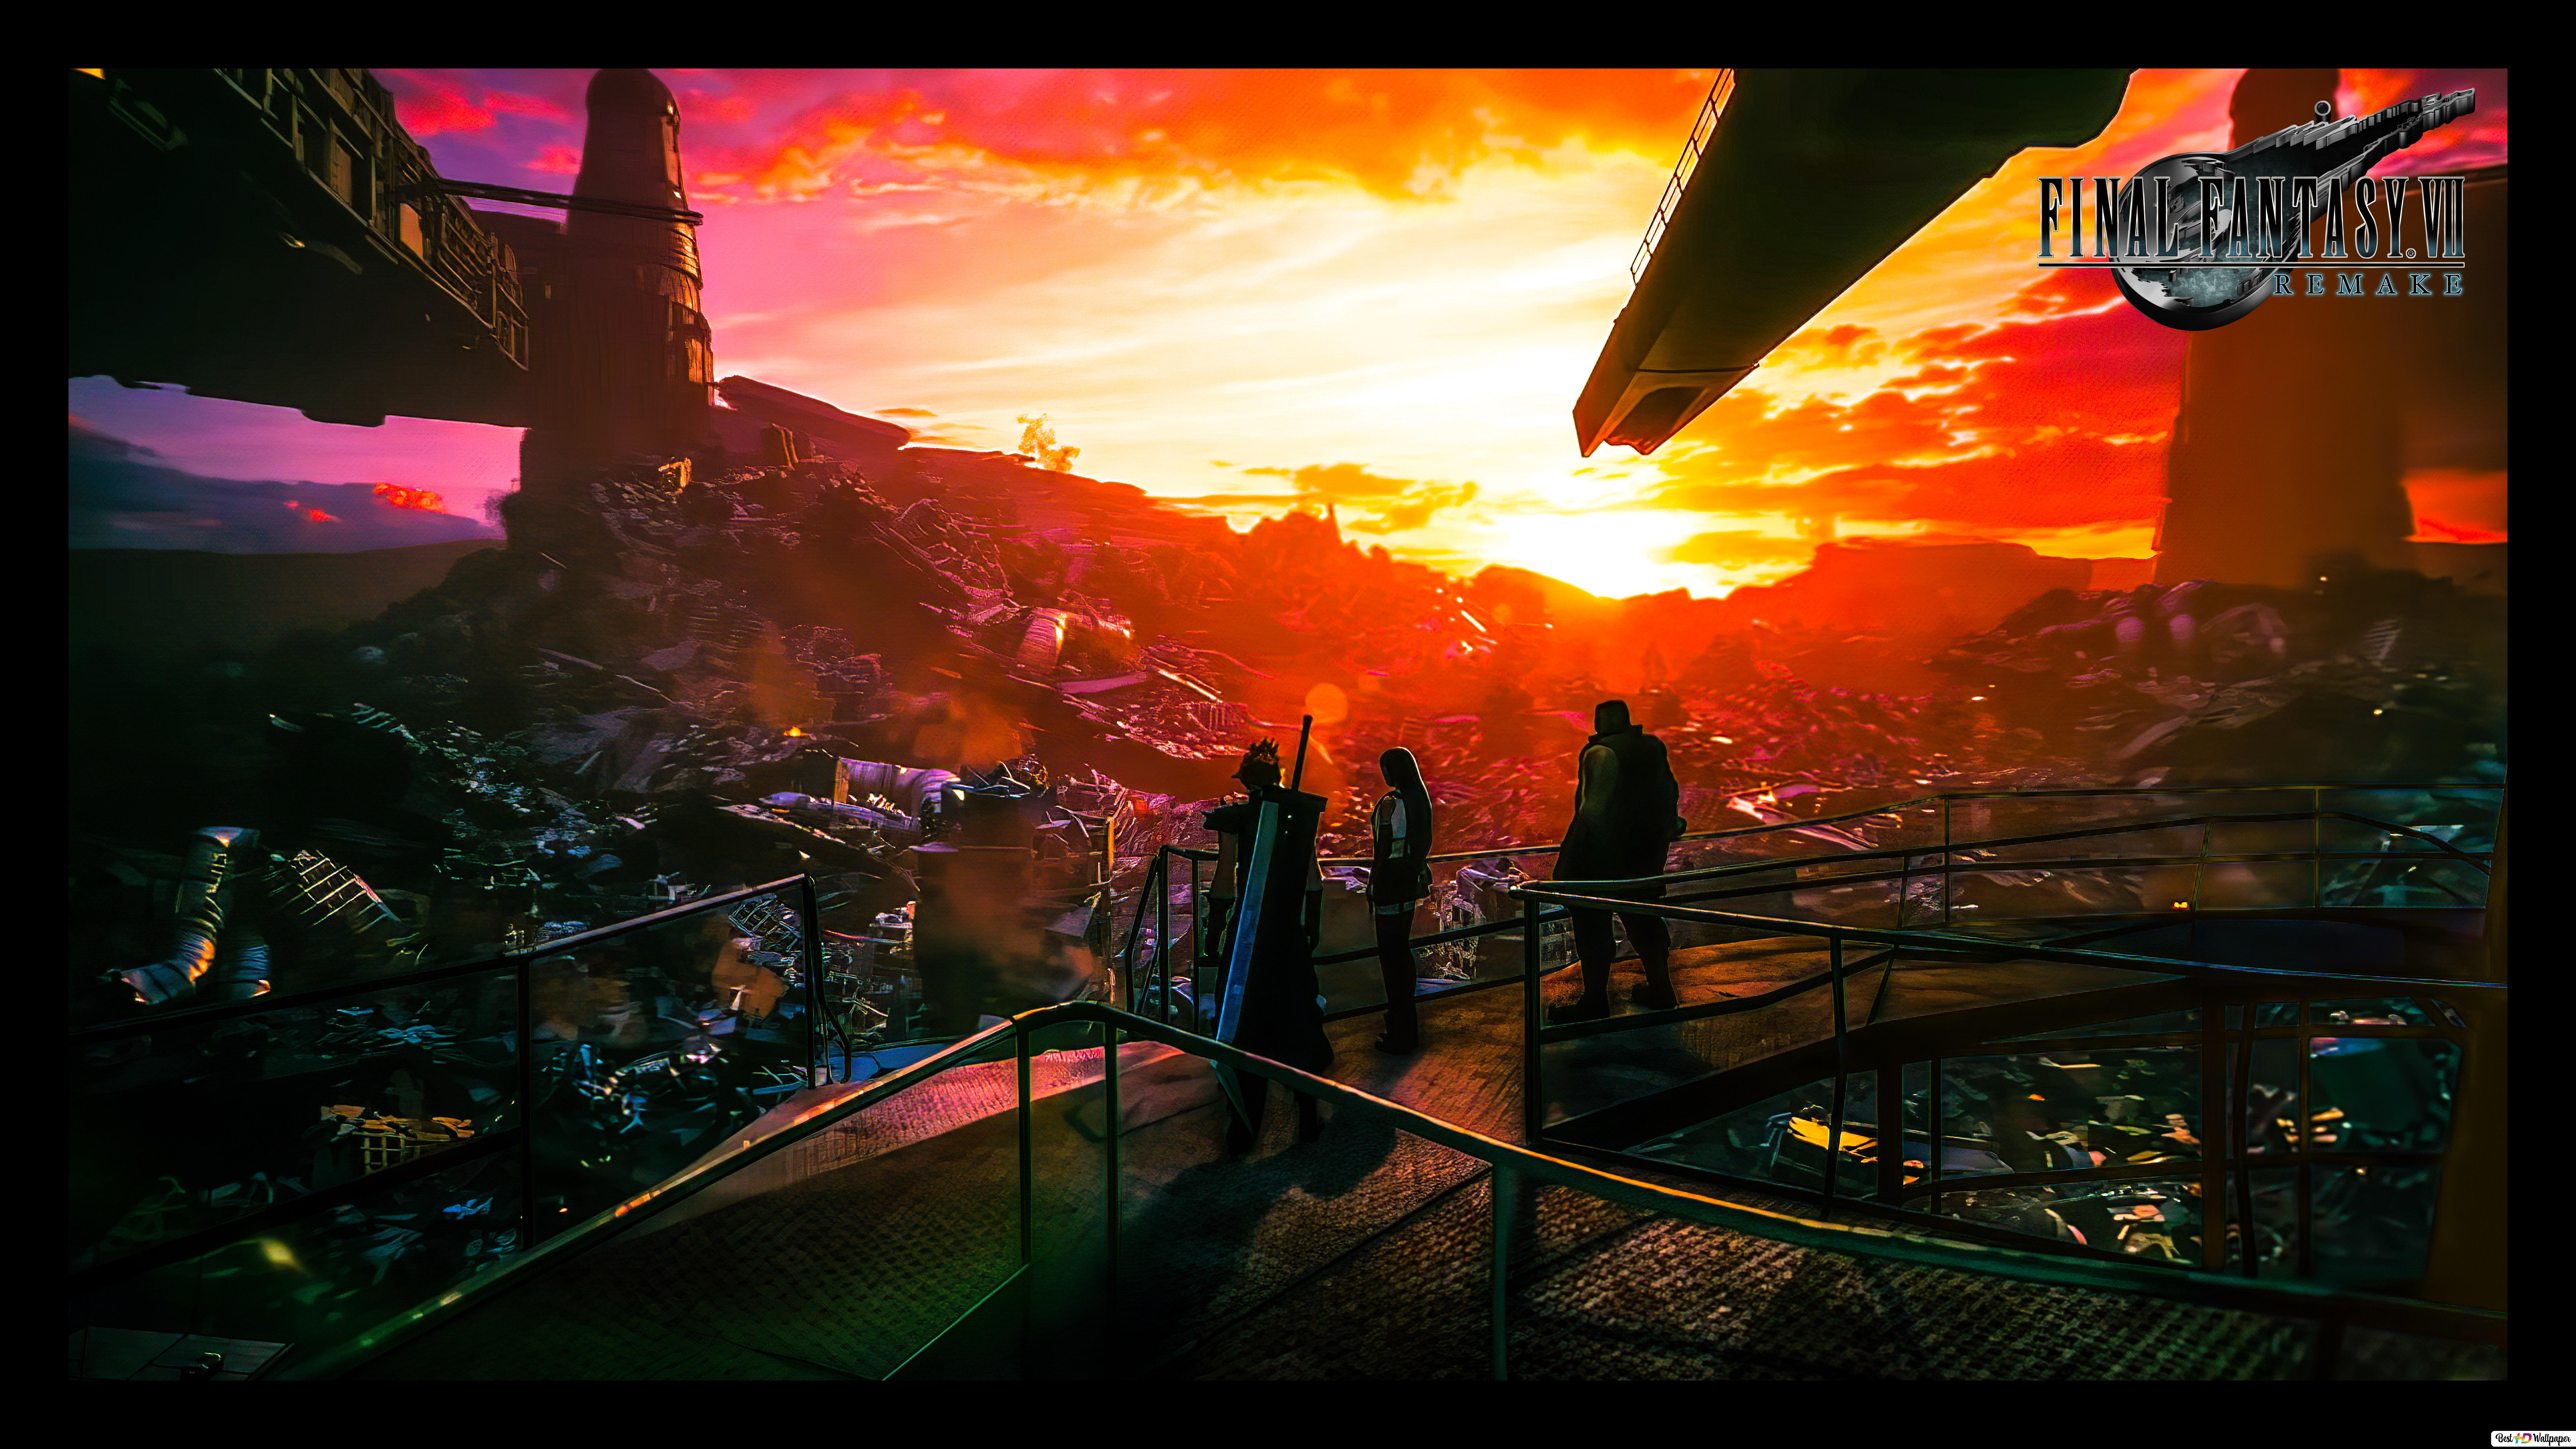 Final Fantasy 7 Remake 8k 4k Hd Wallpaper Download